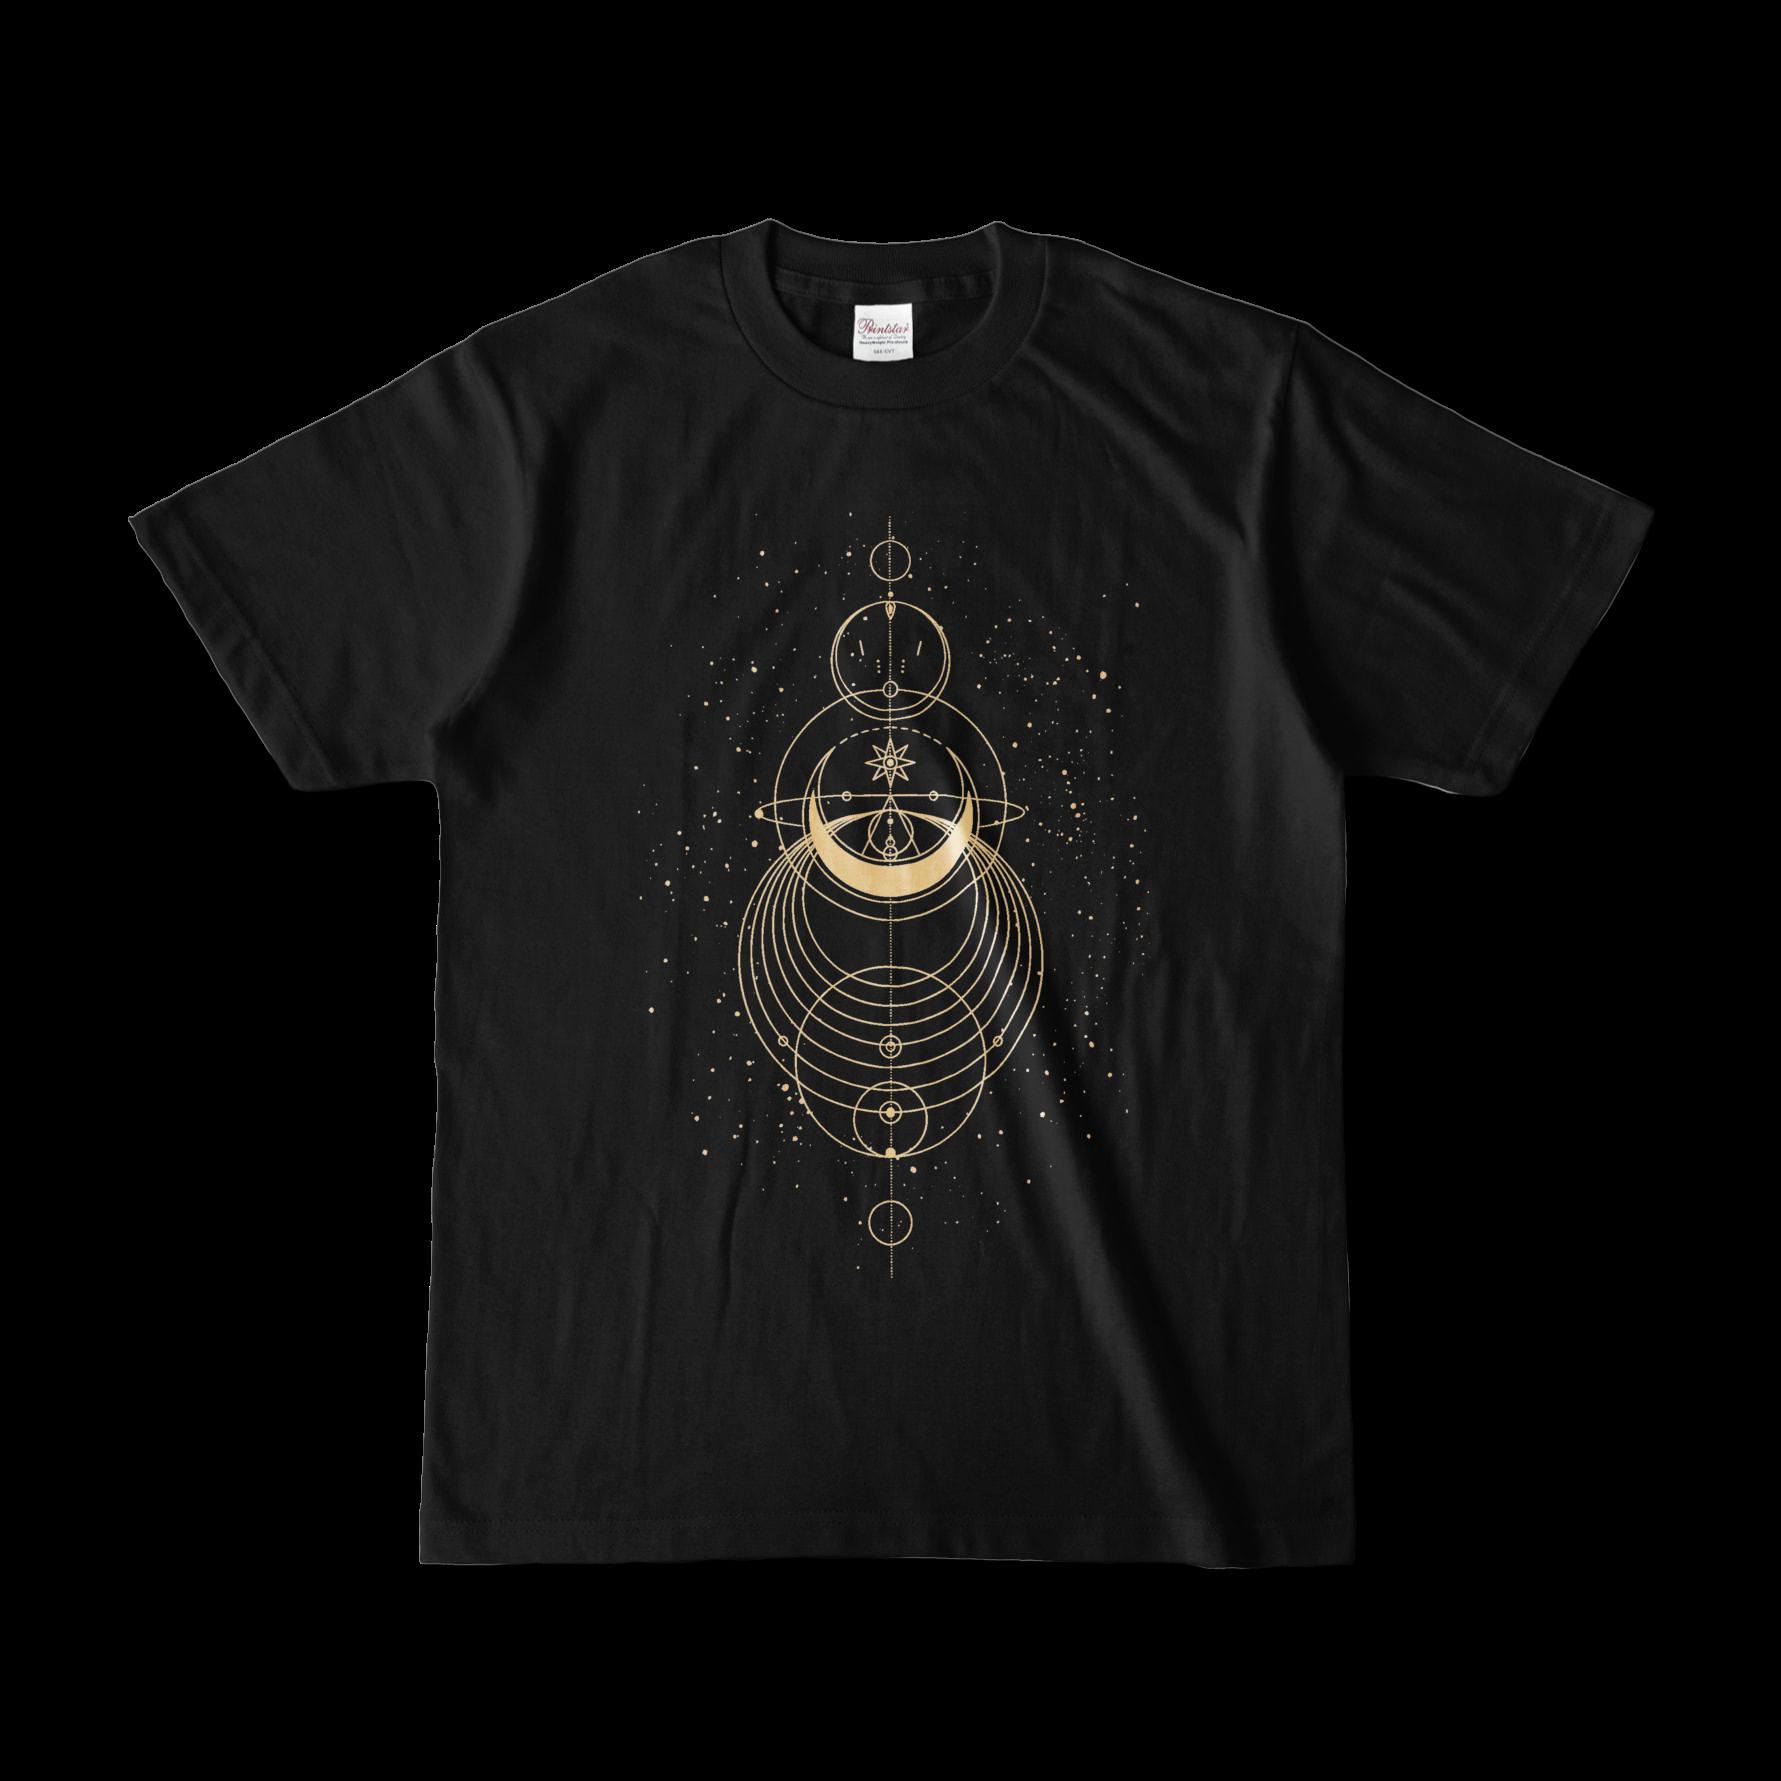 Geometric オリジナルデザインTシャツ ブラック